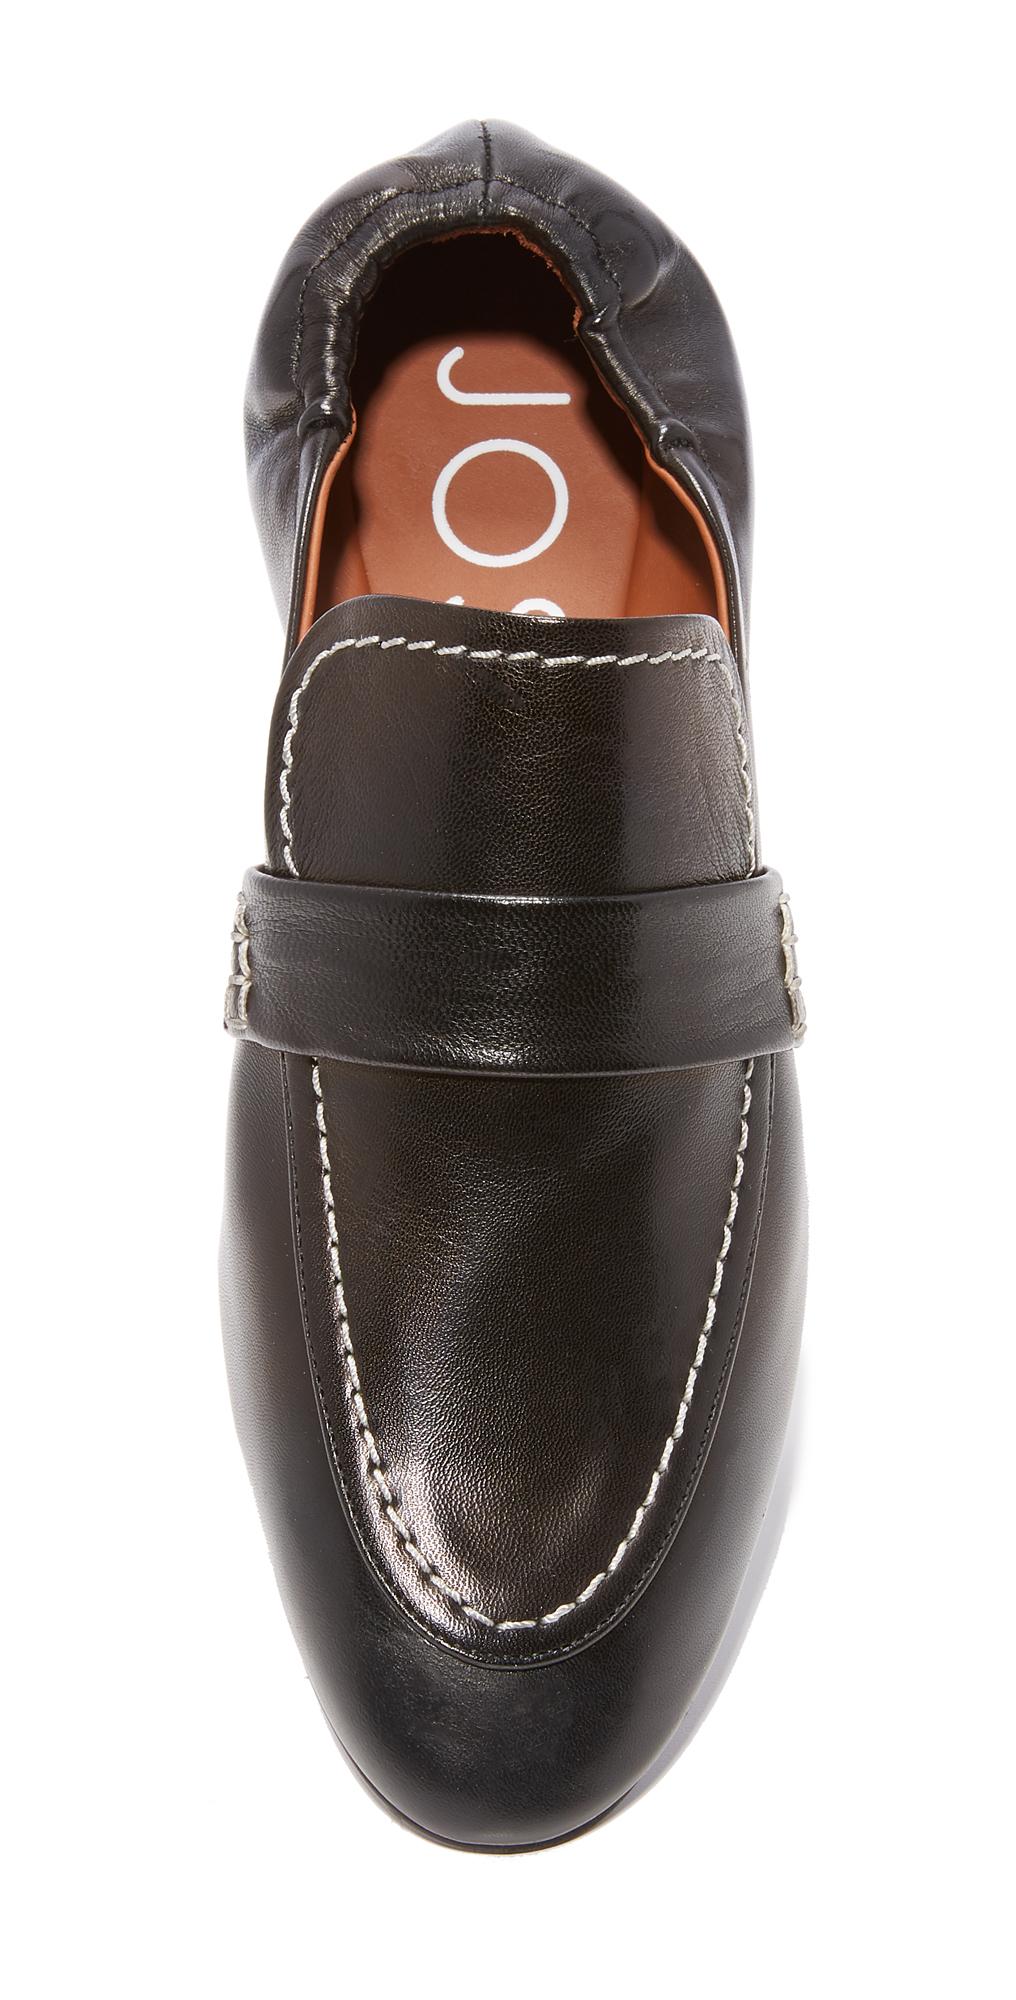 Joseph Souk Convertible Slippers